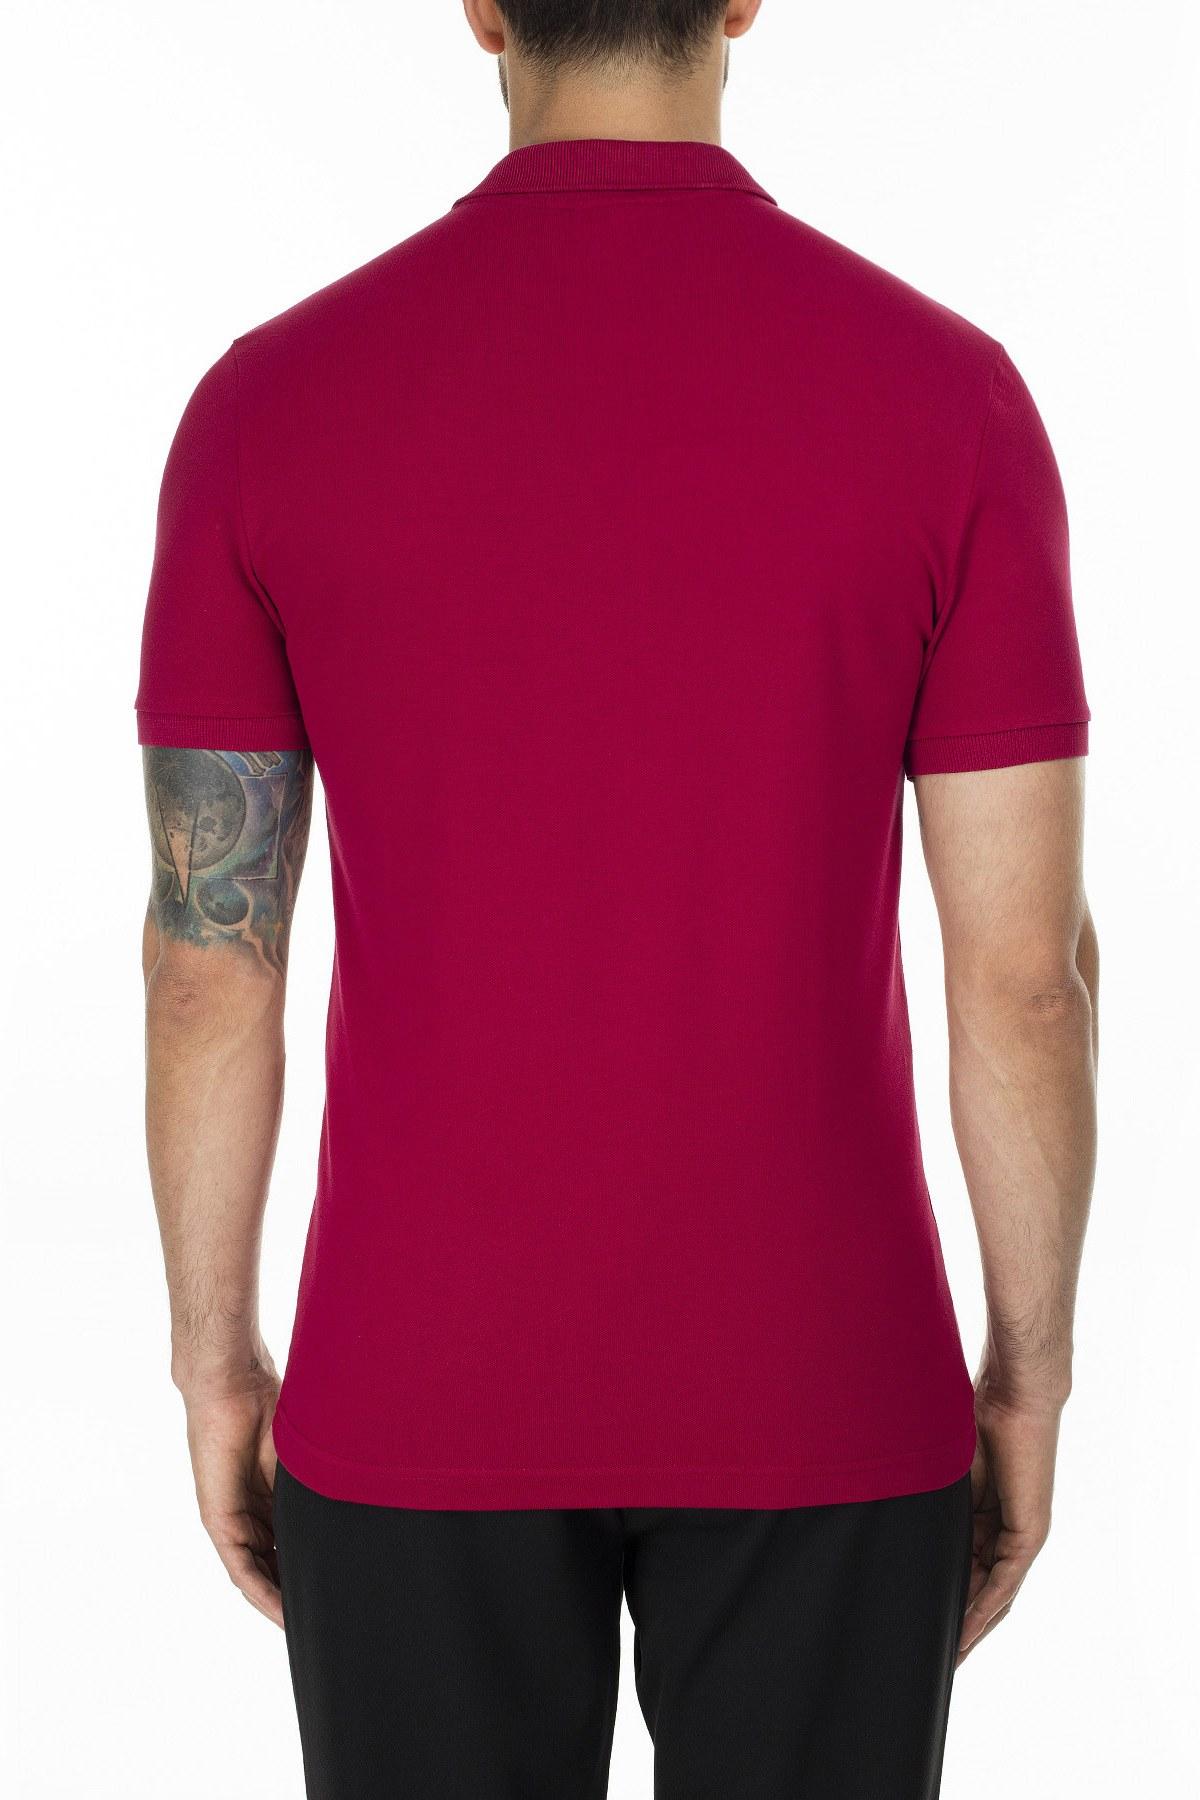 Lacoste Slim Fit T Shirt Erkek Polo PH4014 476 BORDO